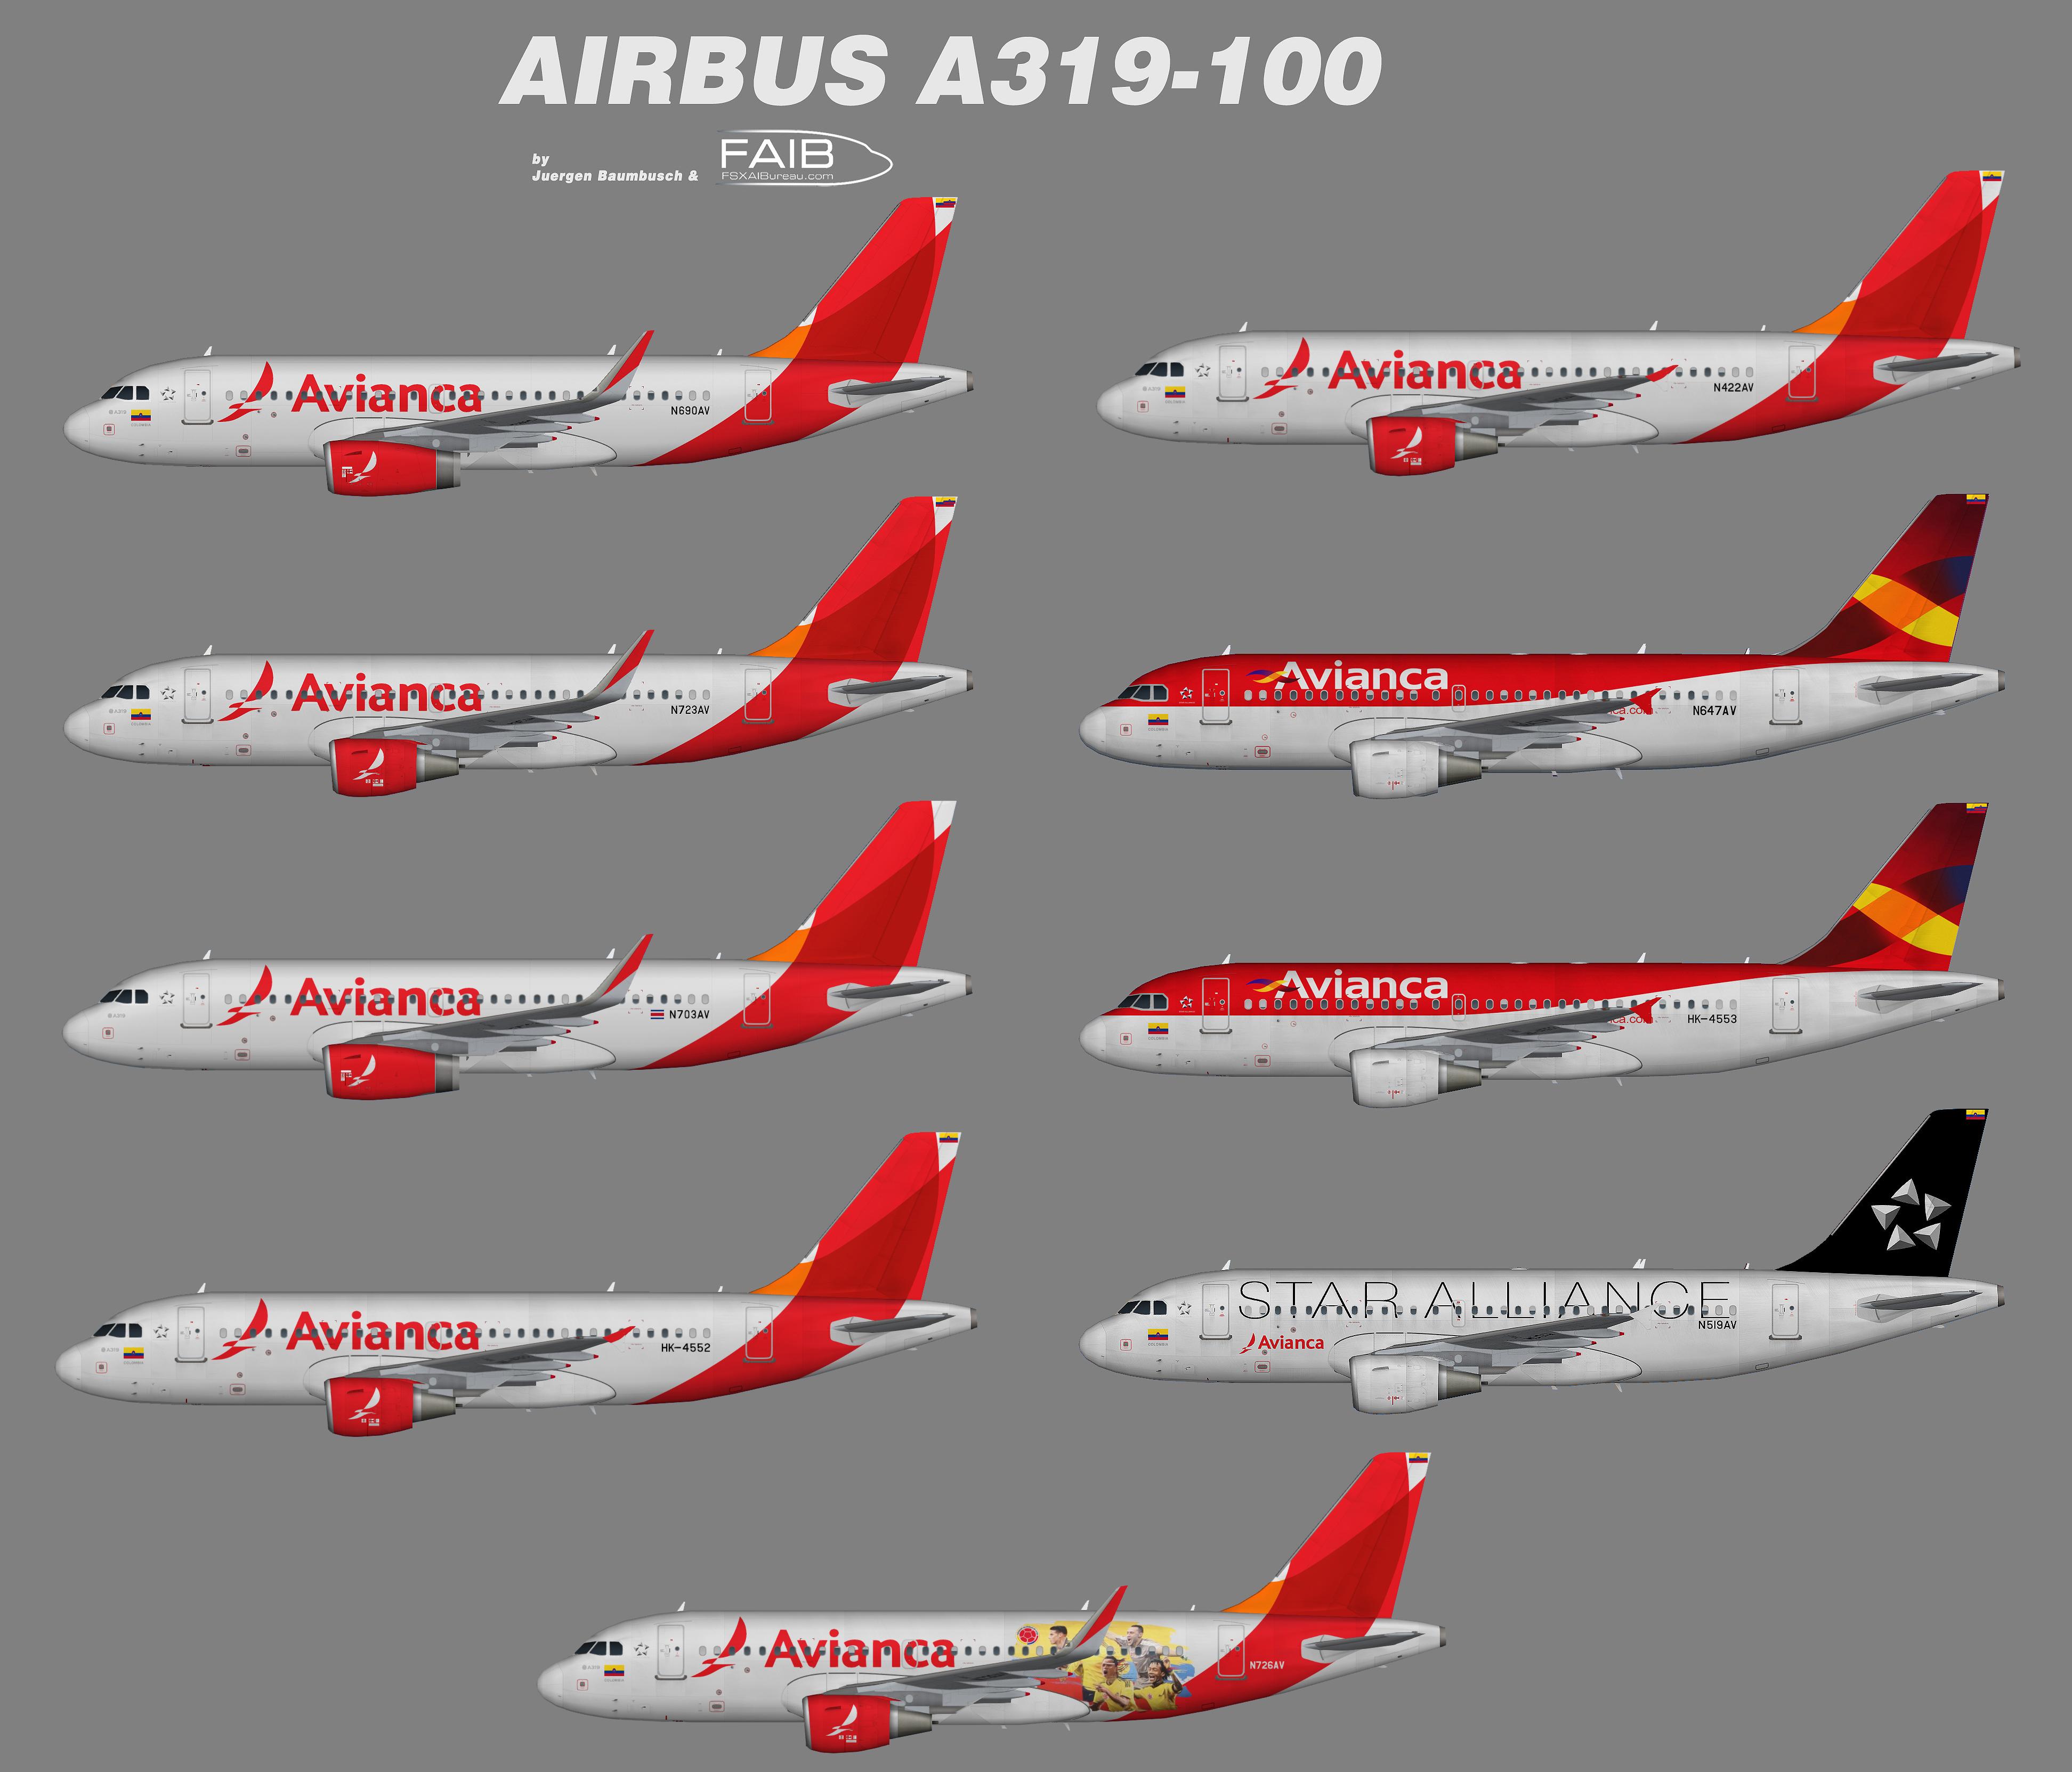 Icelandic airlines